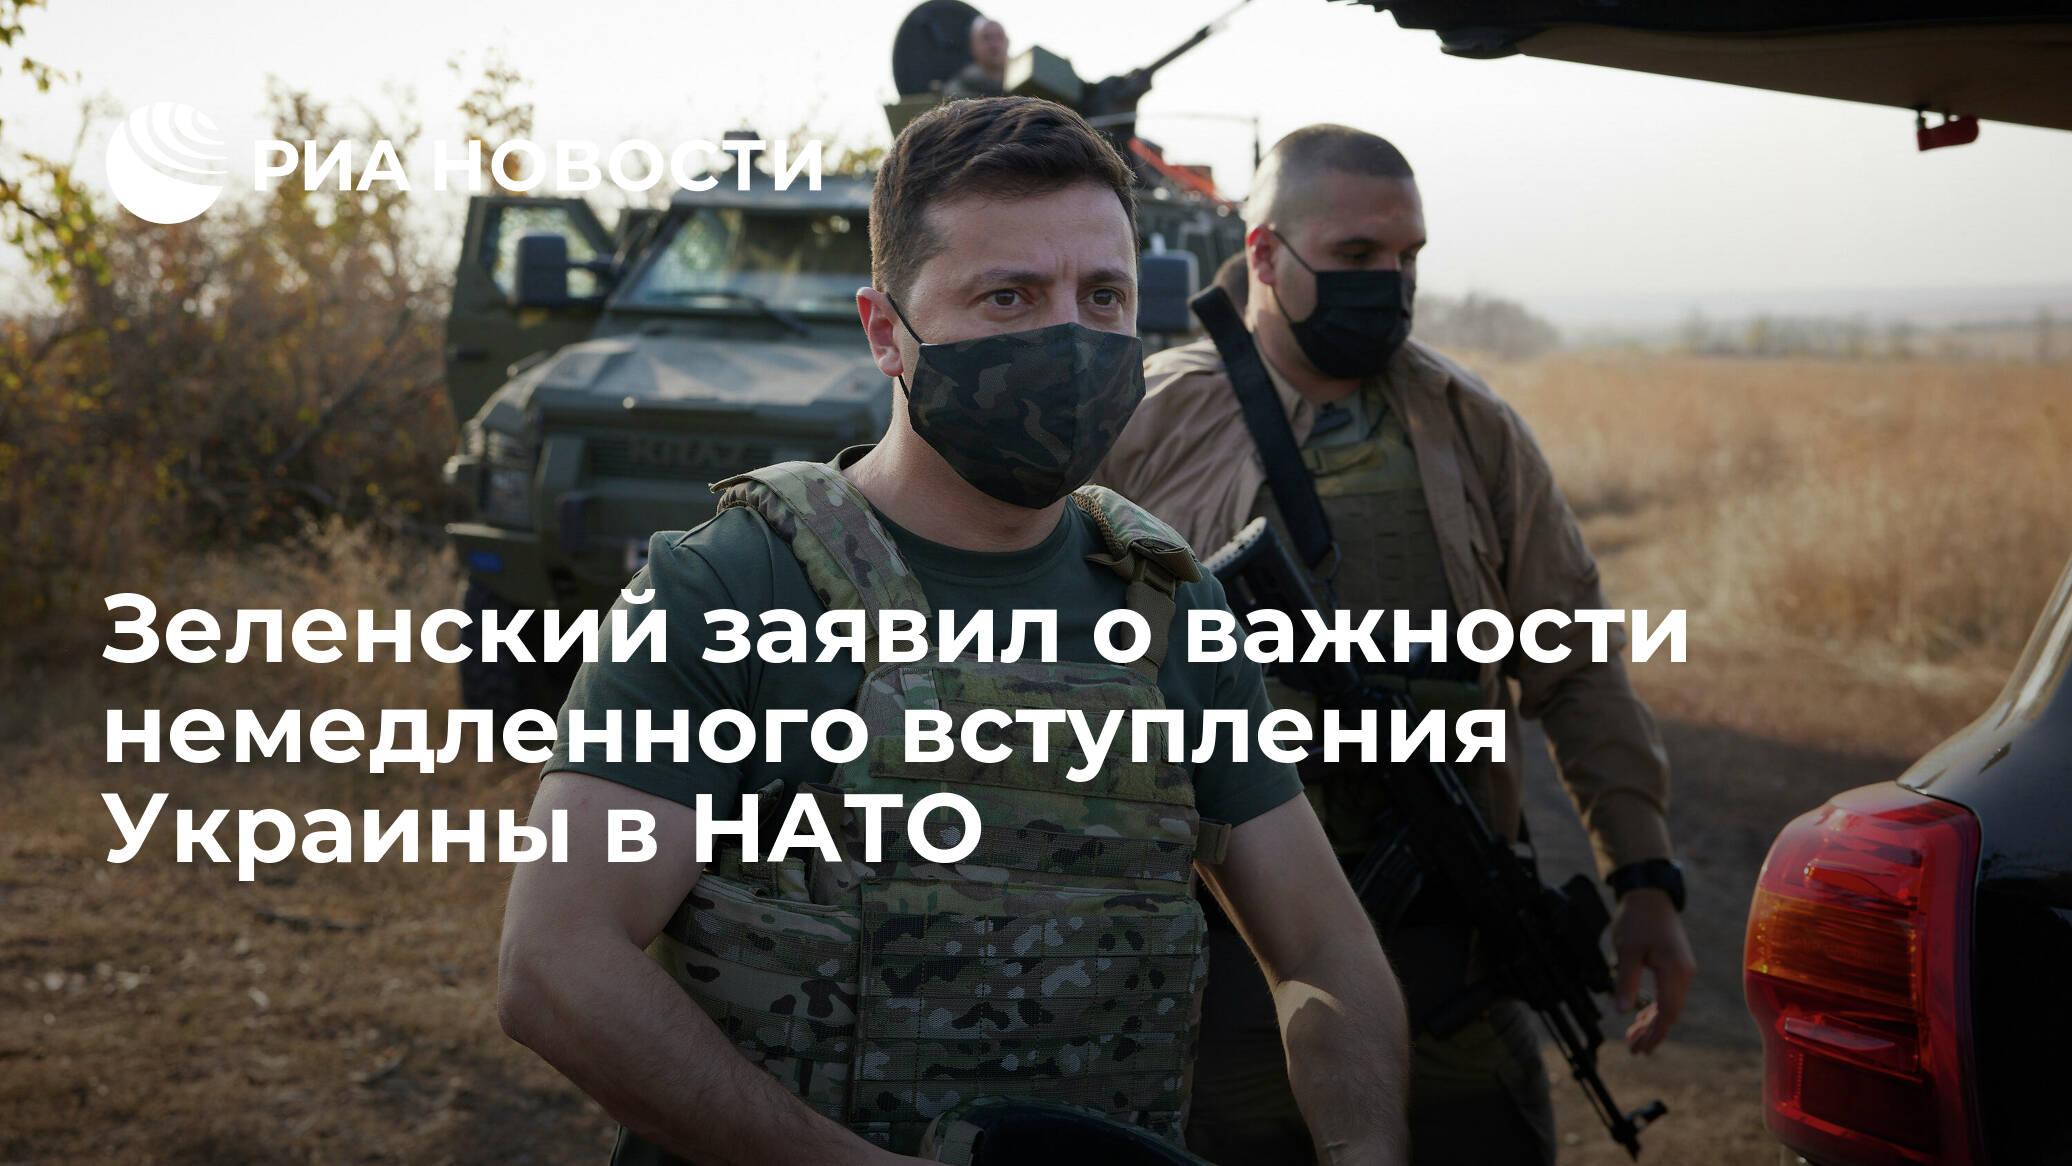 Zelensky said the importance of Ukraine's immediate accession to NATO